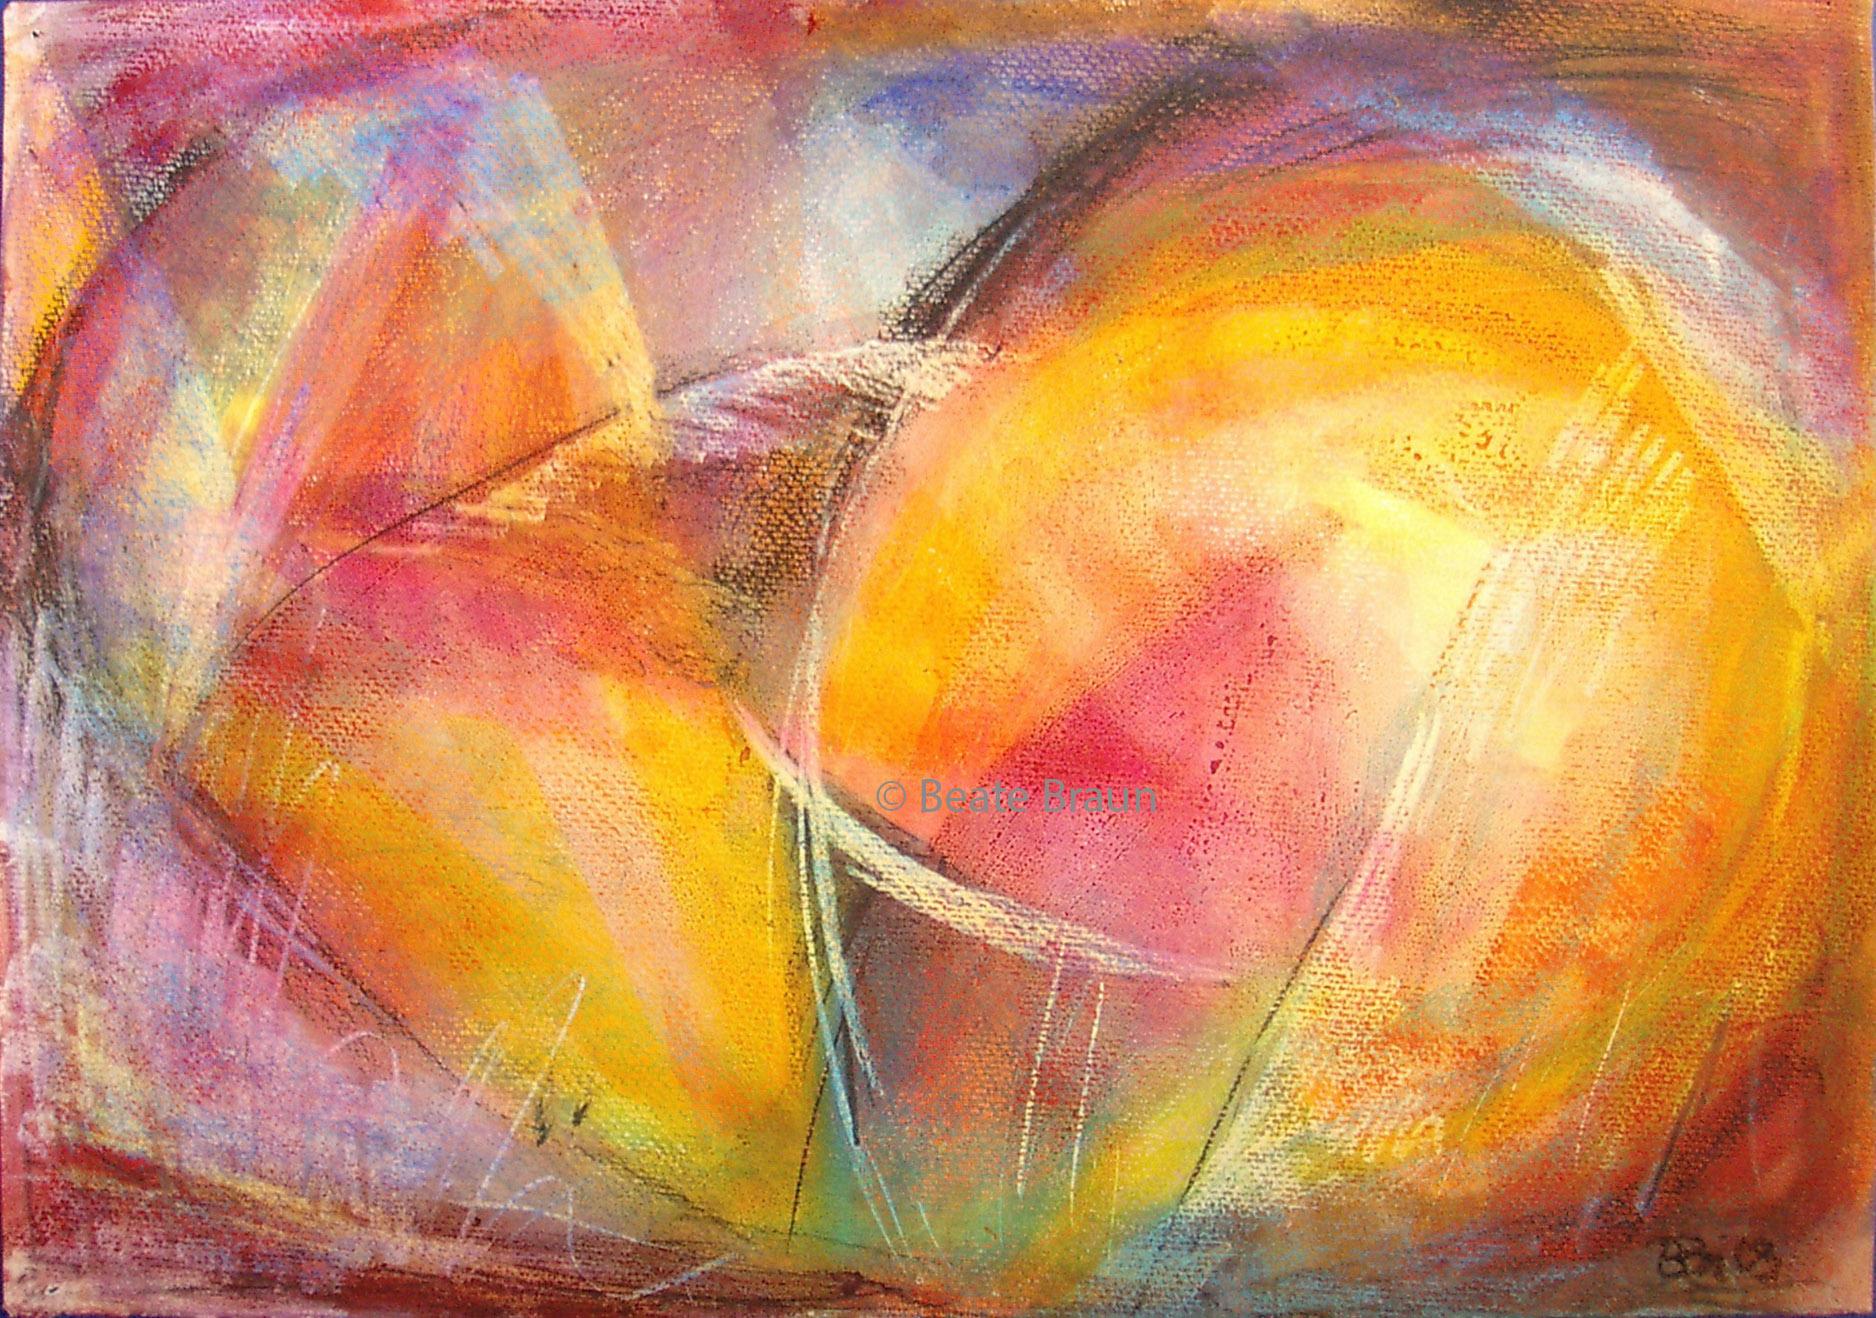 Komposition 1 | 44 x 30 cm | Pastell auf Papier | 2013